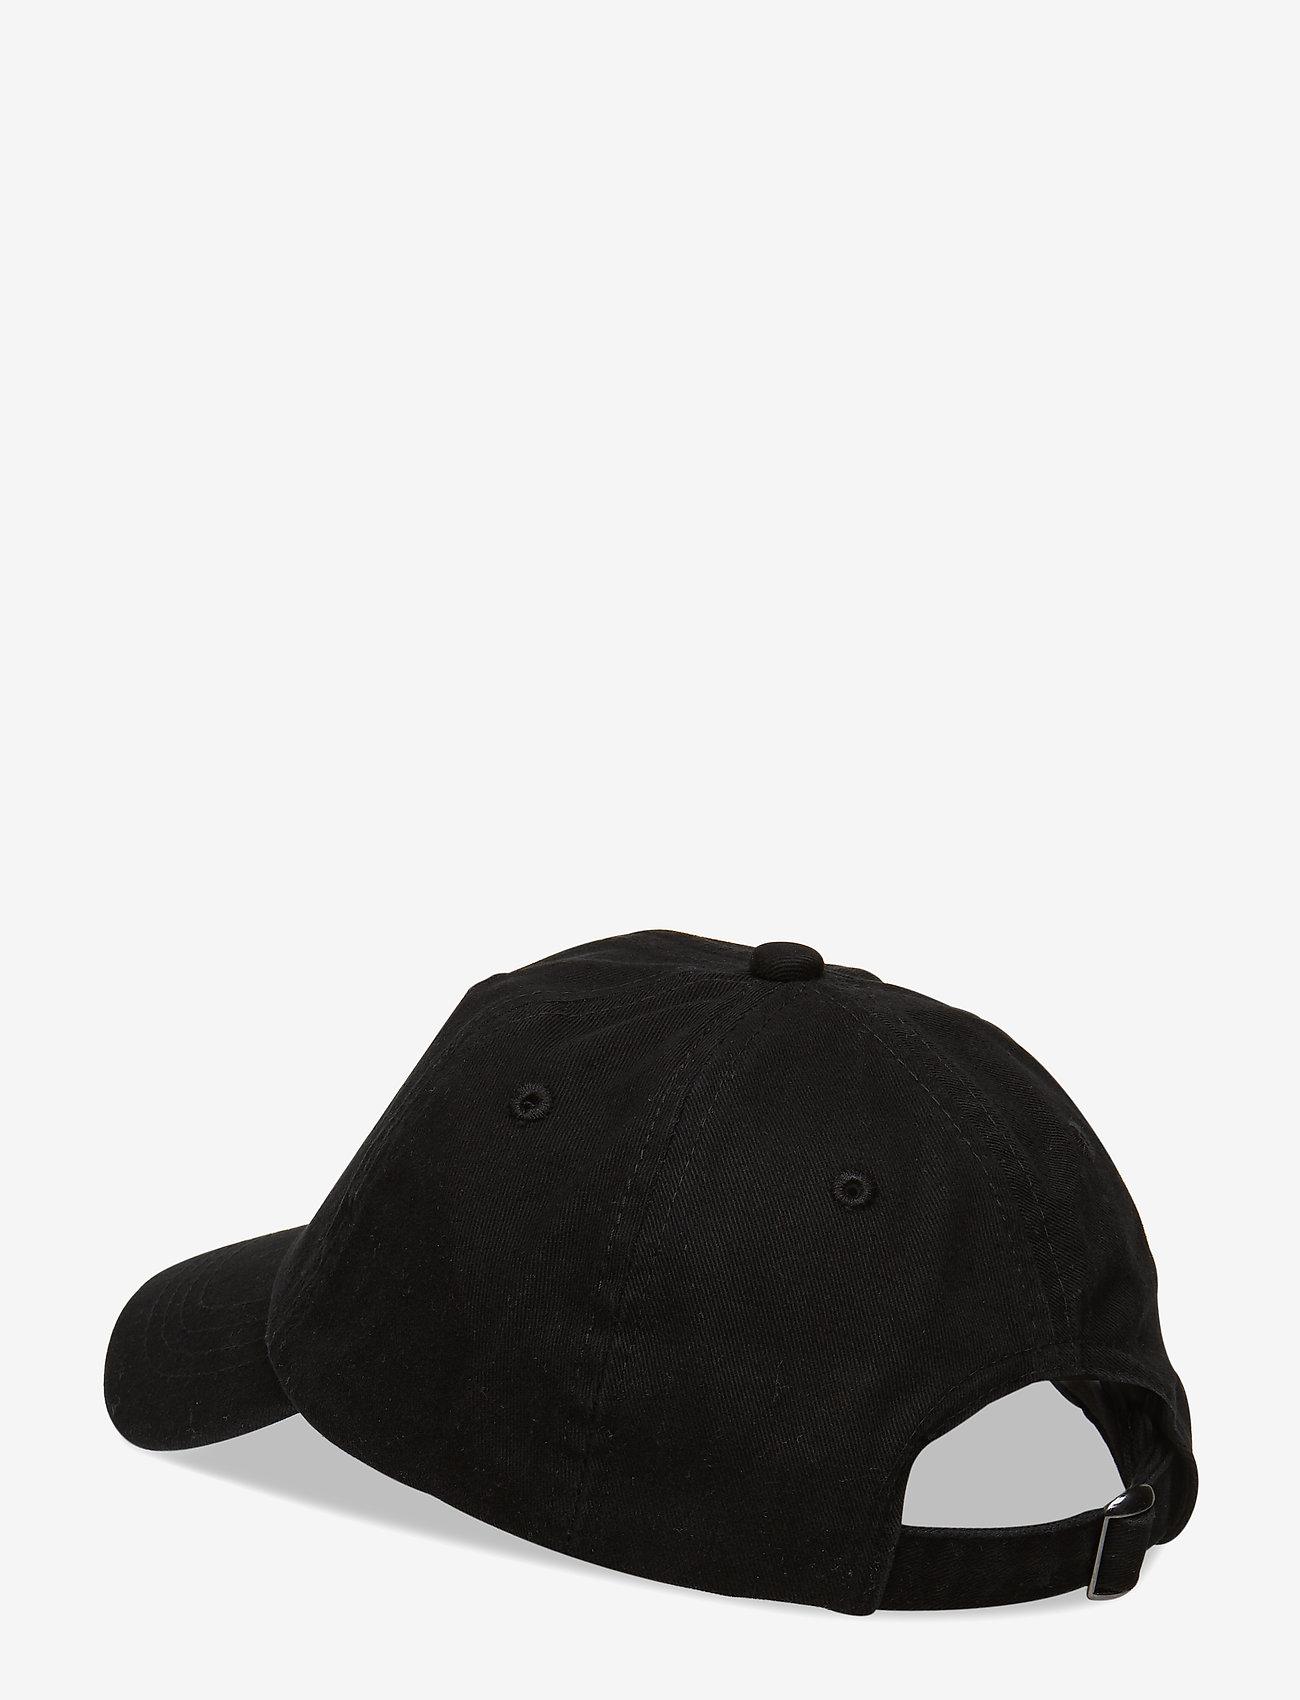 Wood Wood - Sim kids cap - czapki - black - 1